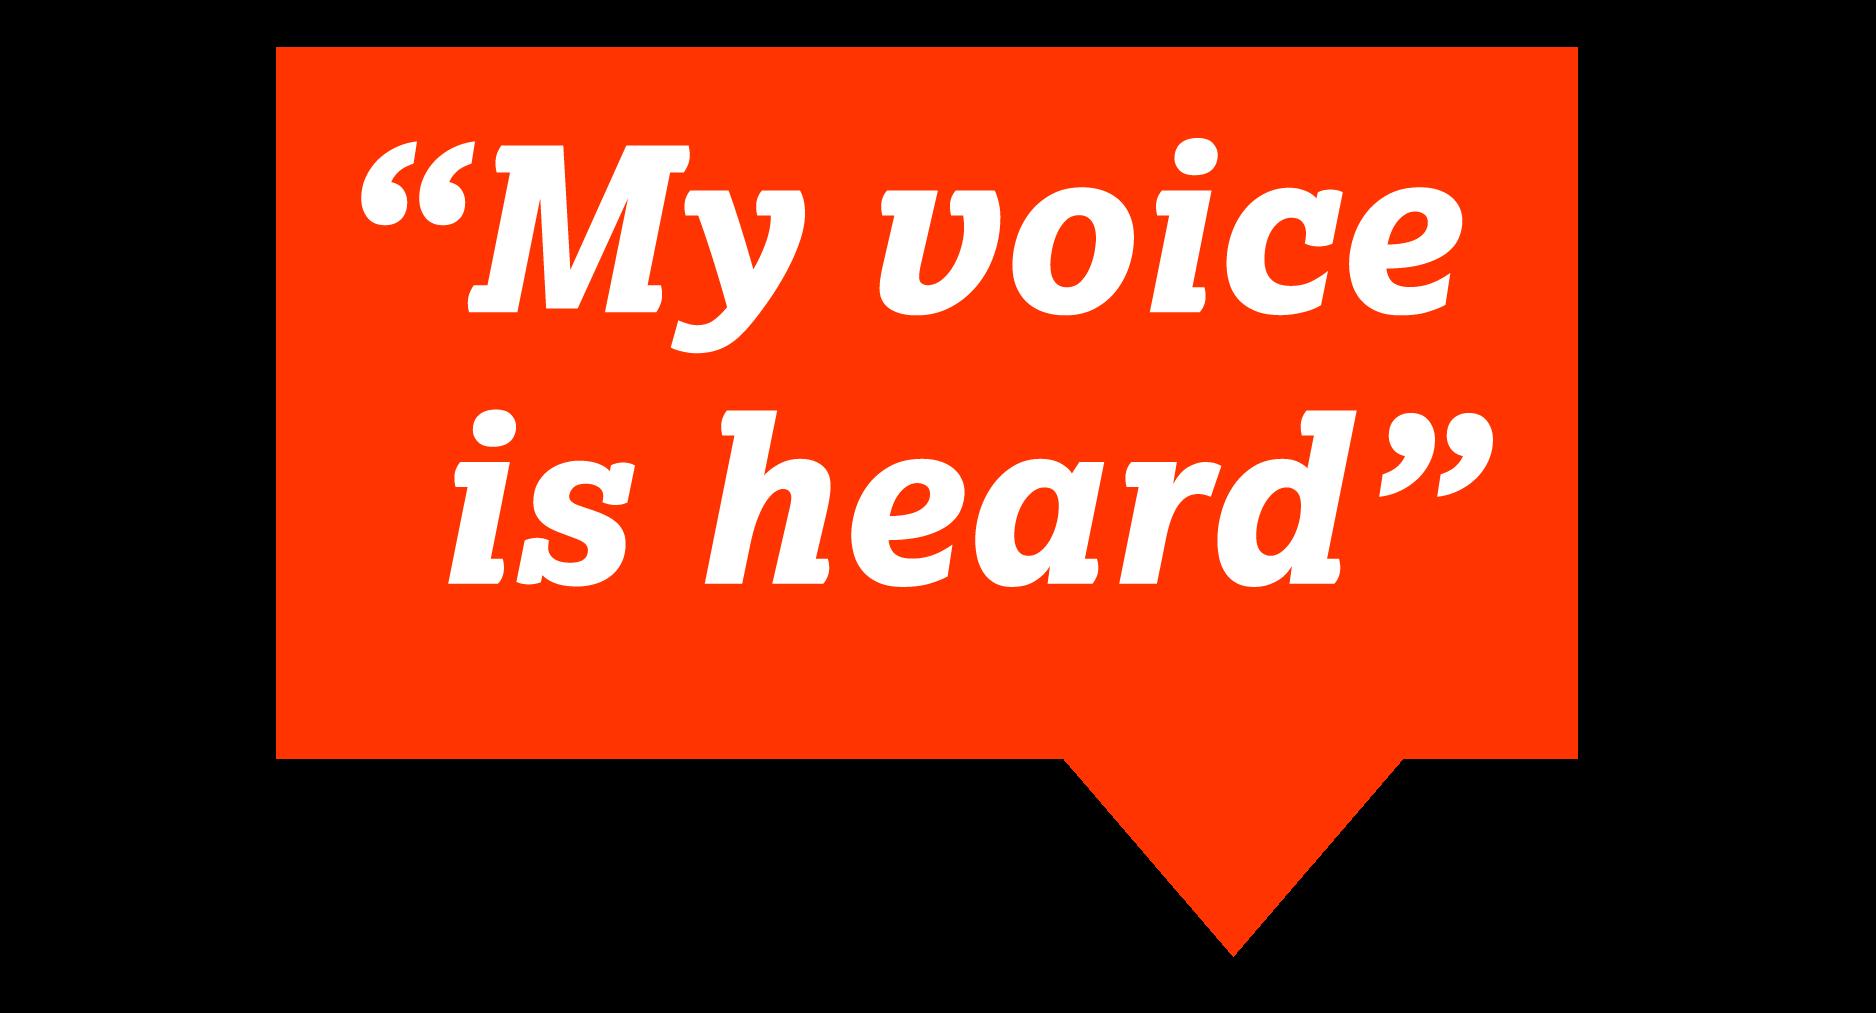 My-voice-is-heard